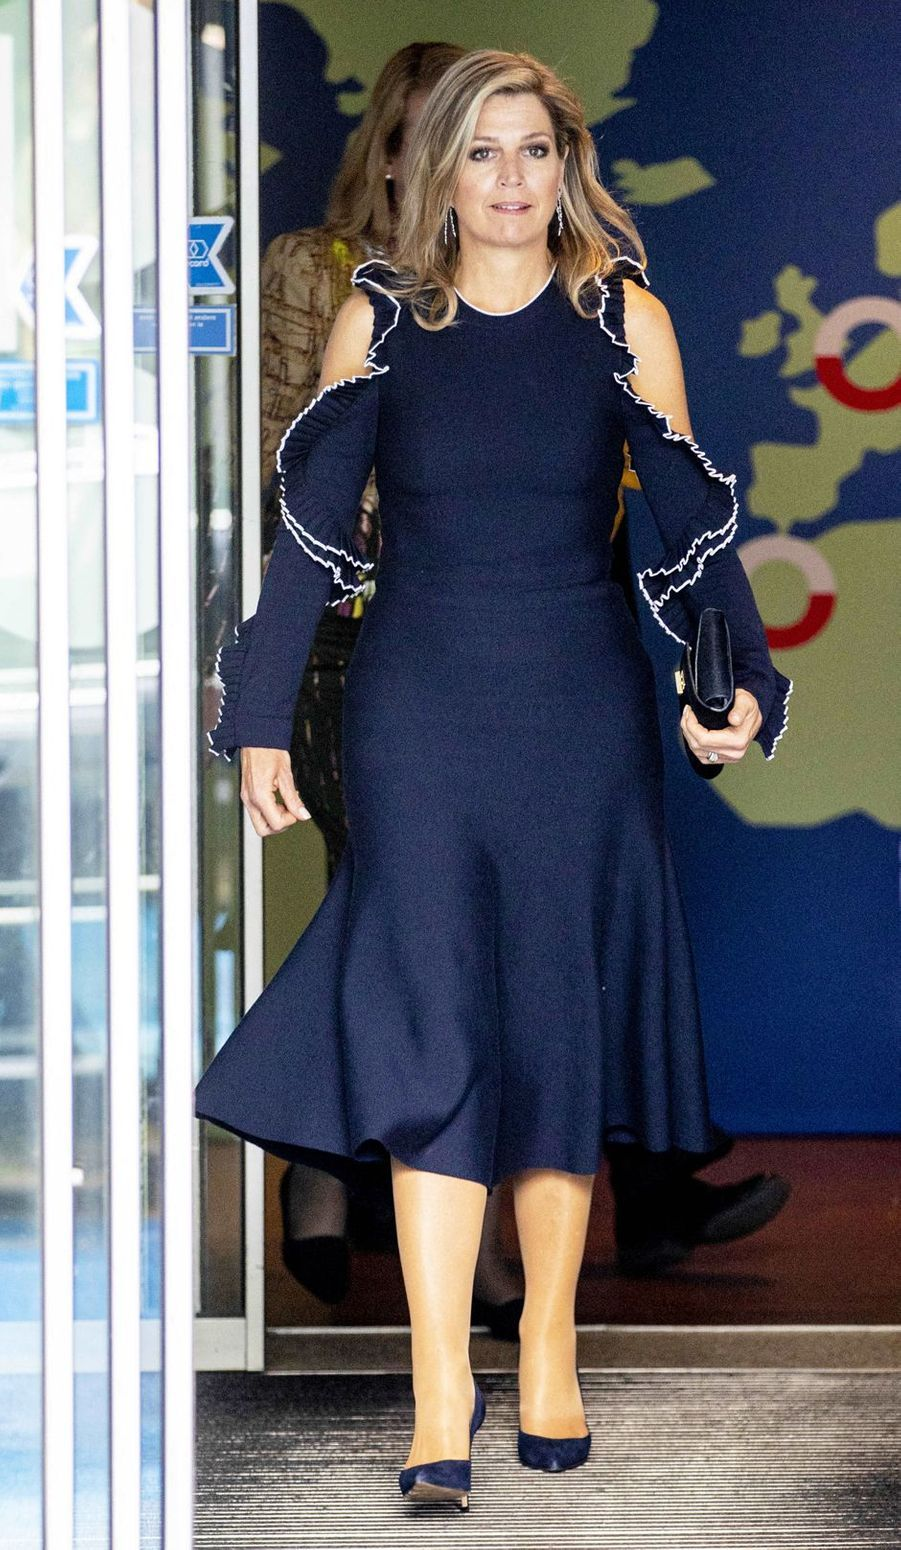 La reine Maxima des Pays-Bas en Oscar de la Renta à La Haye, le 4 juin 2019